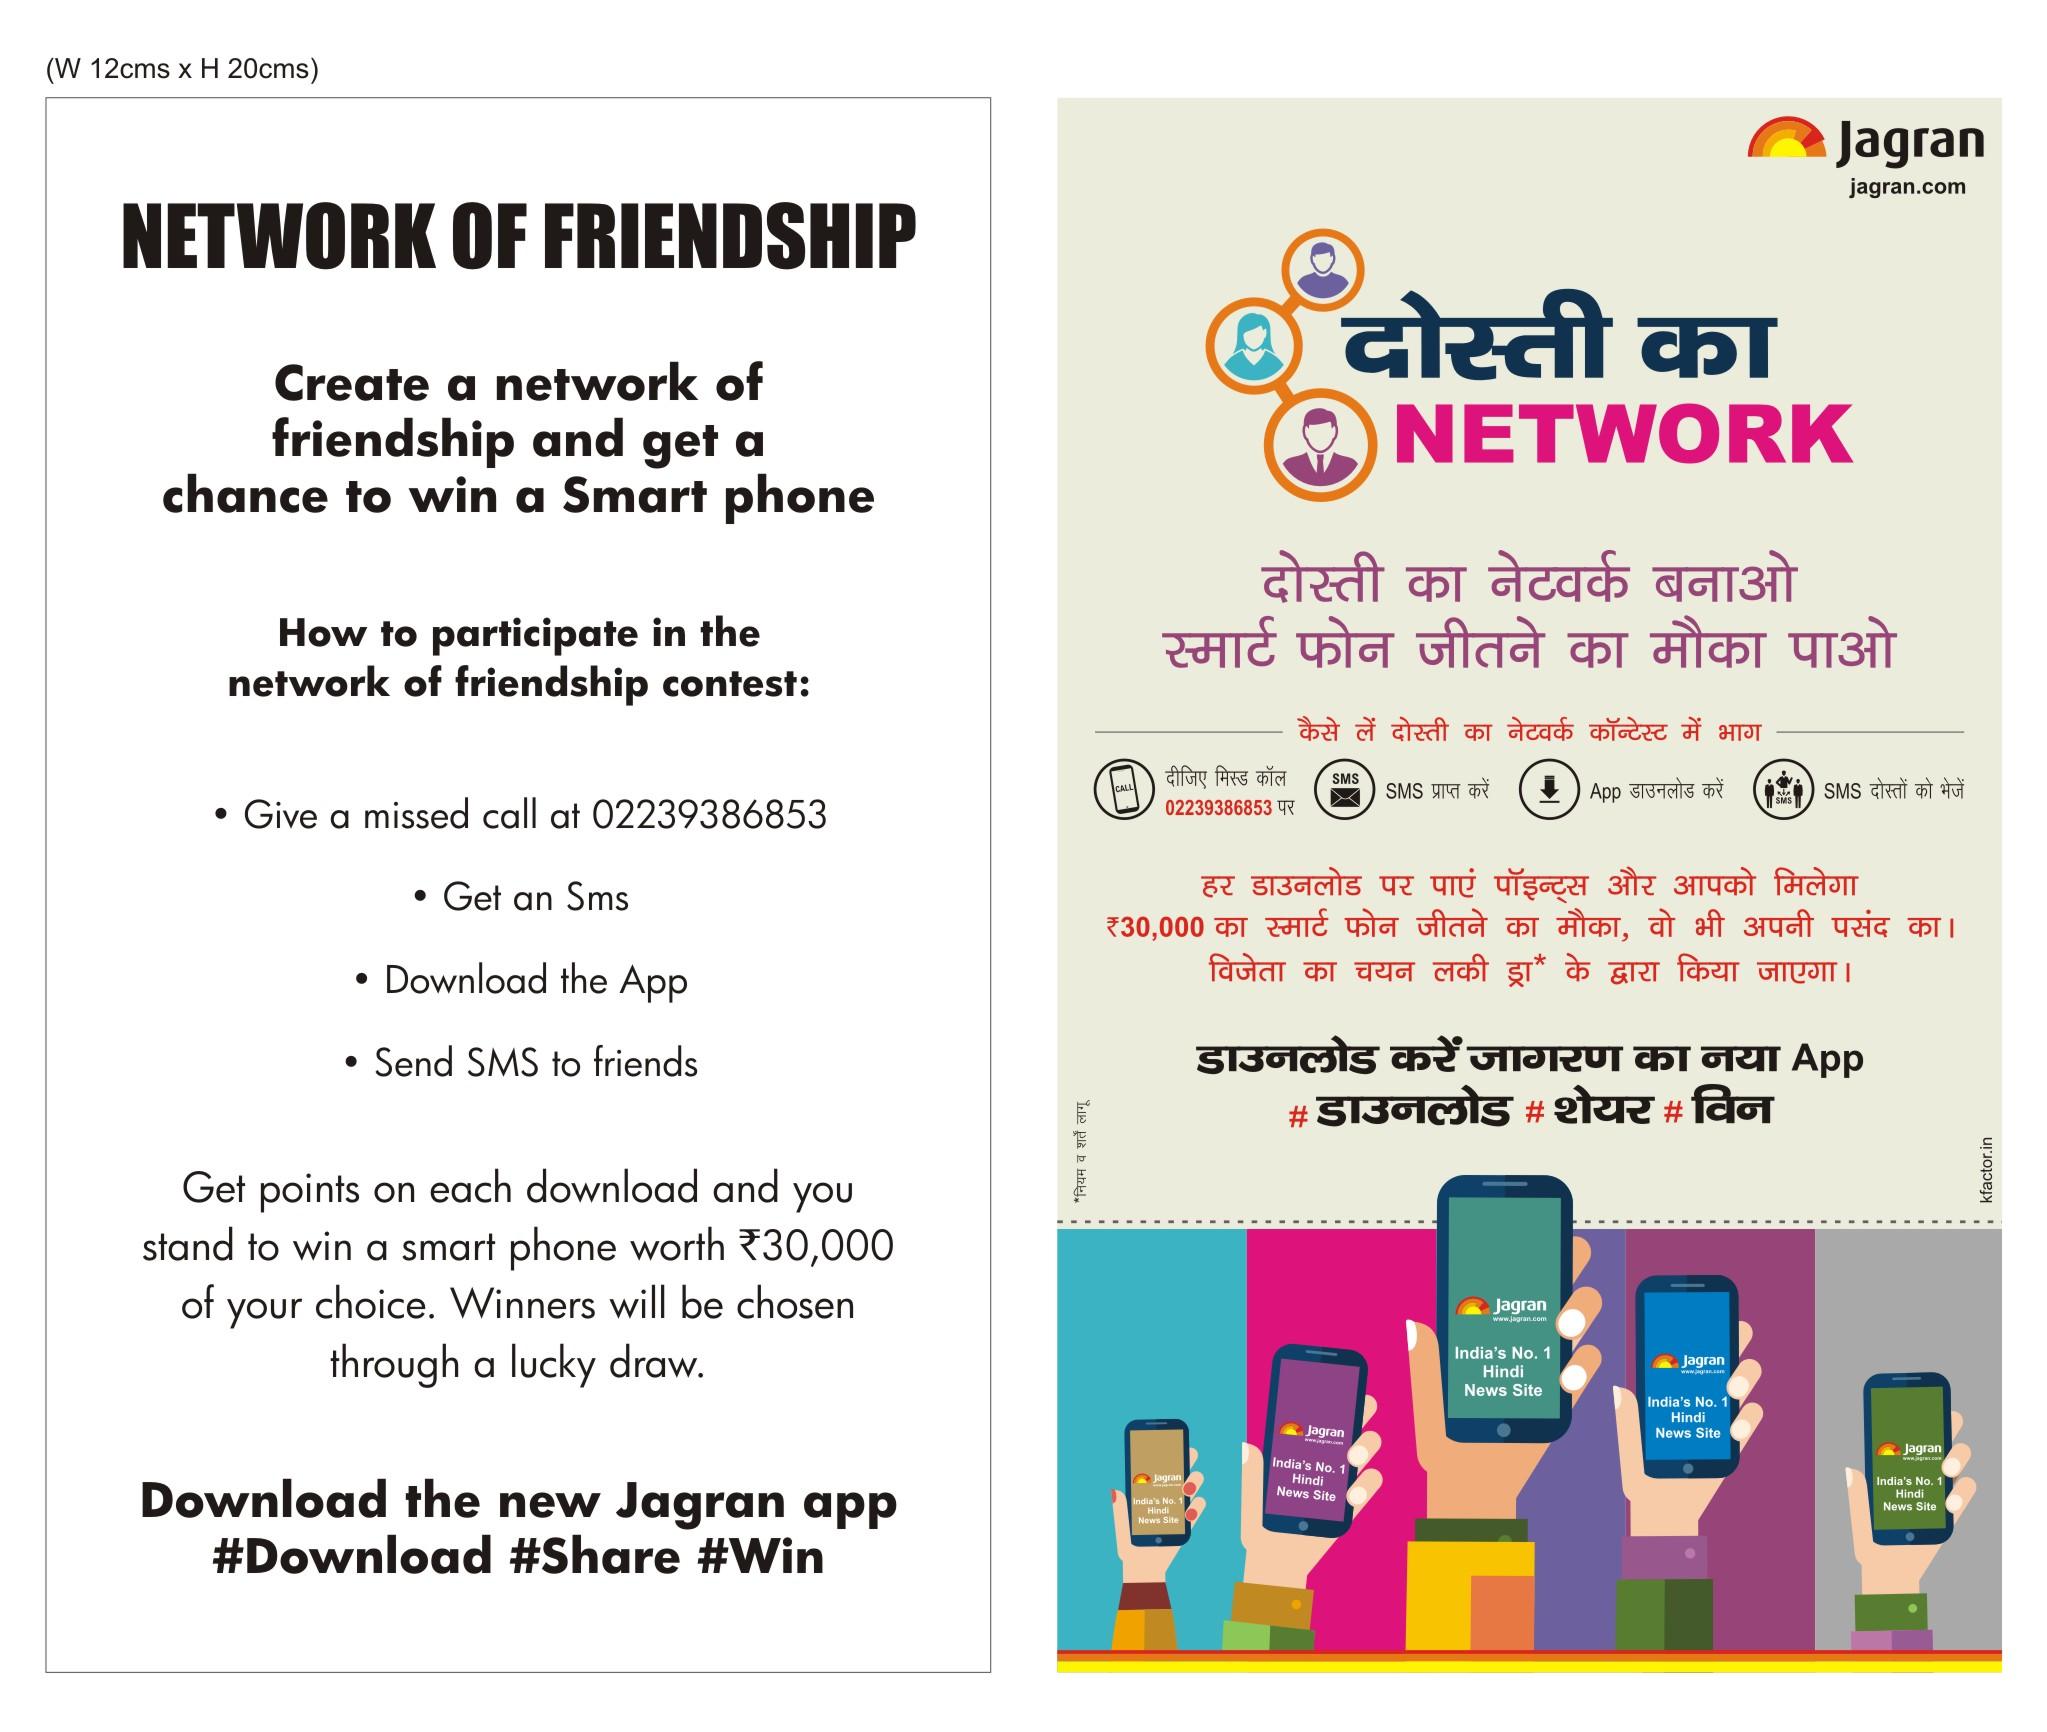 Driving App Downloads through a Network of Friendship